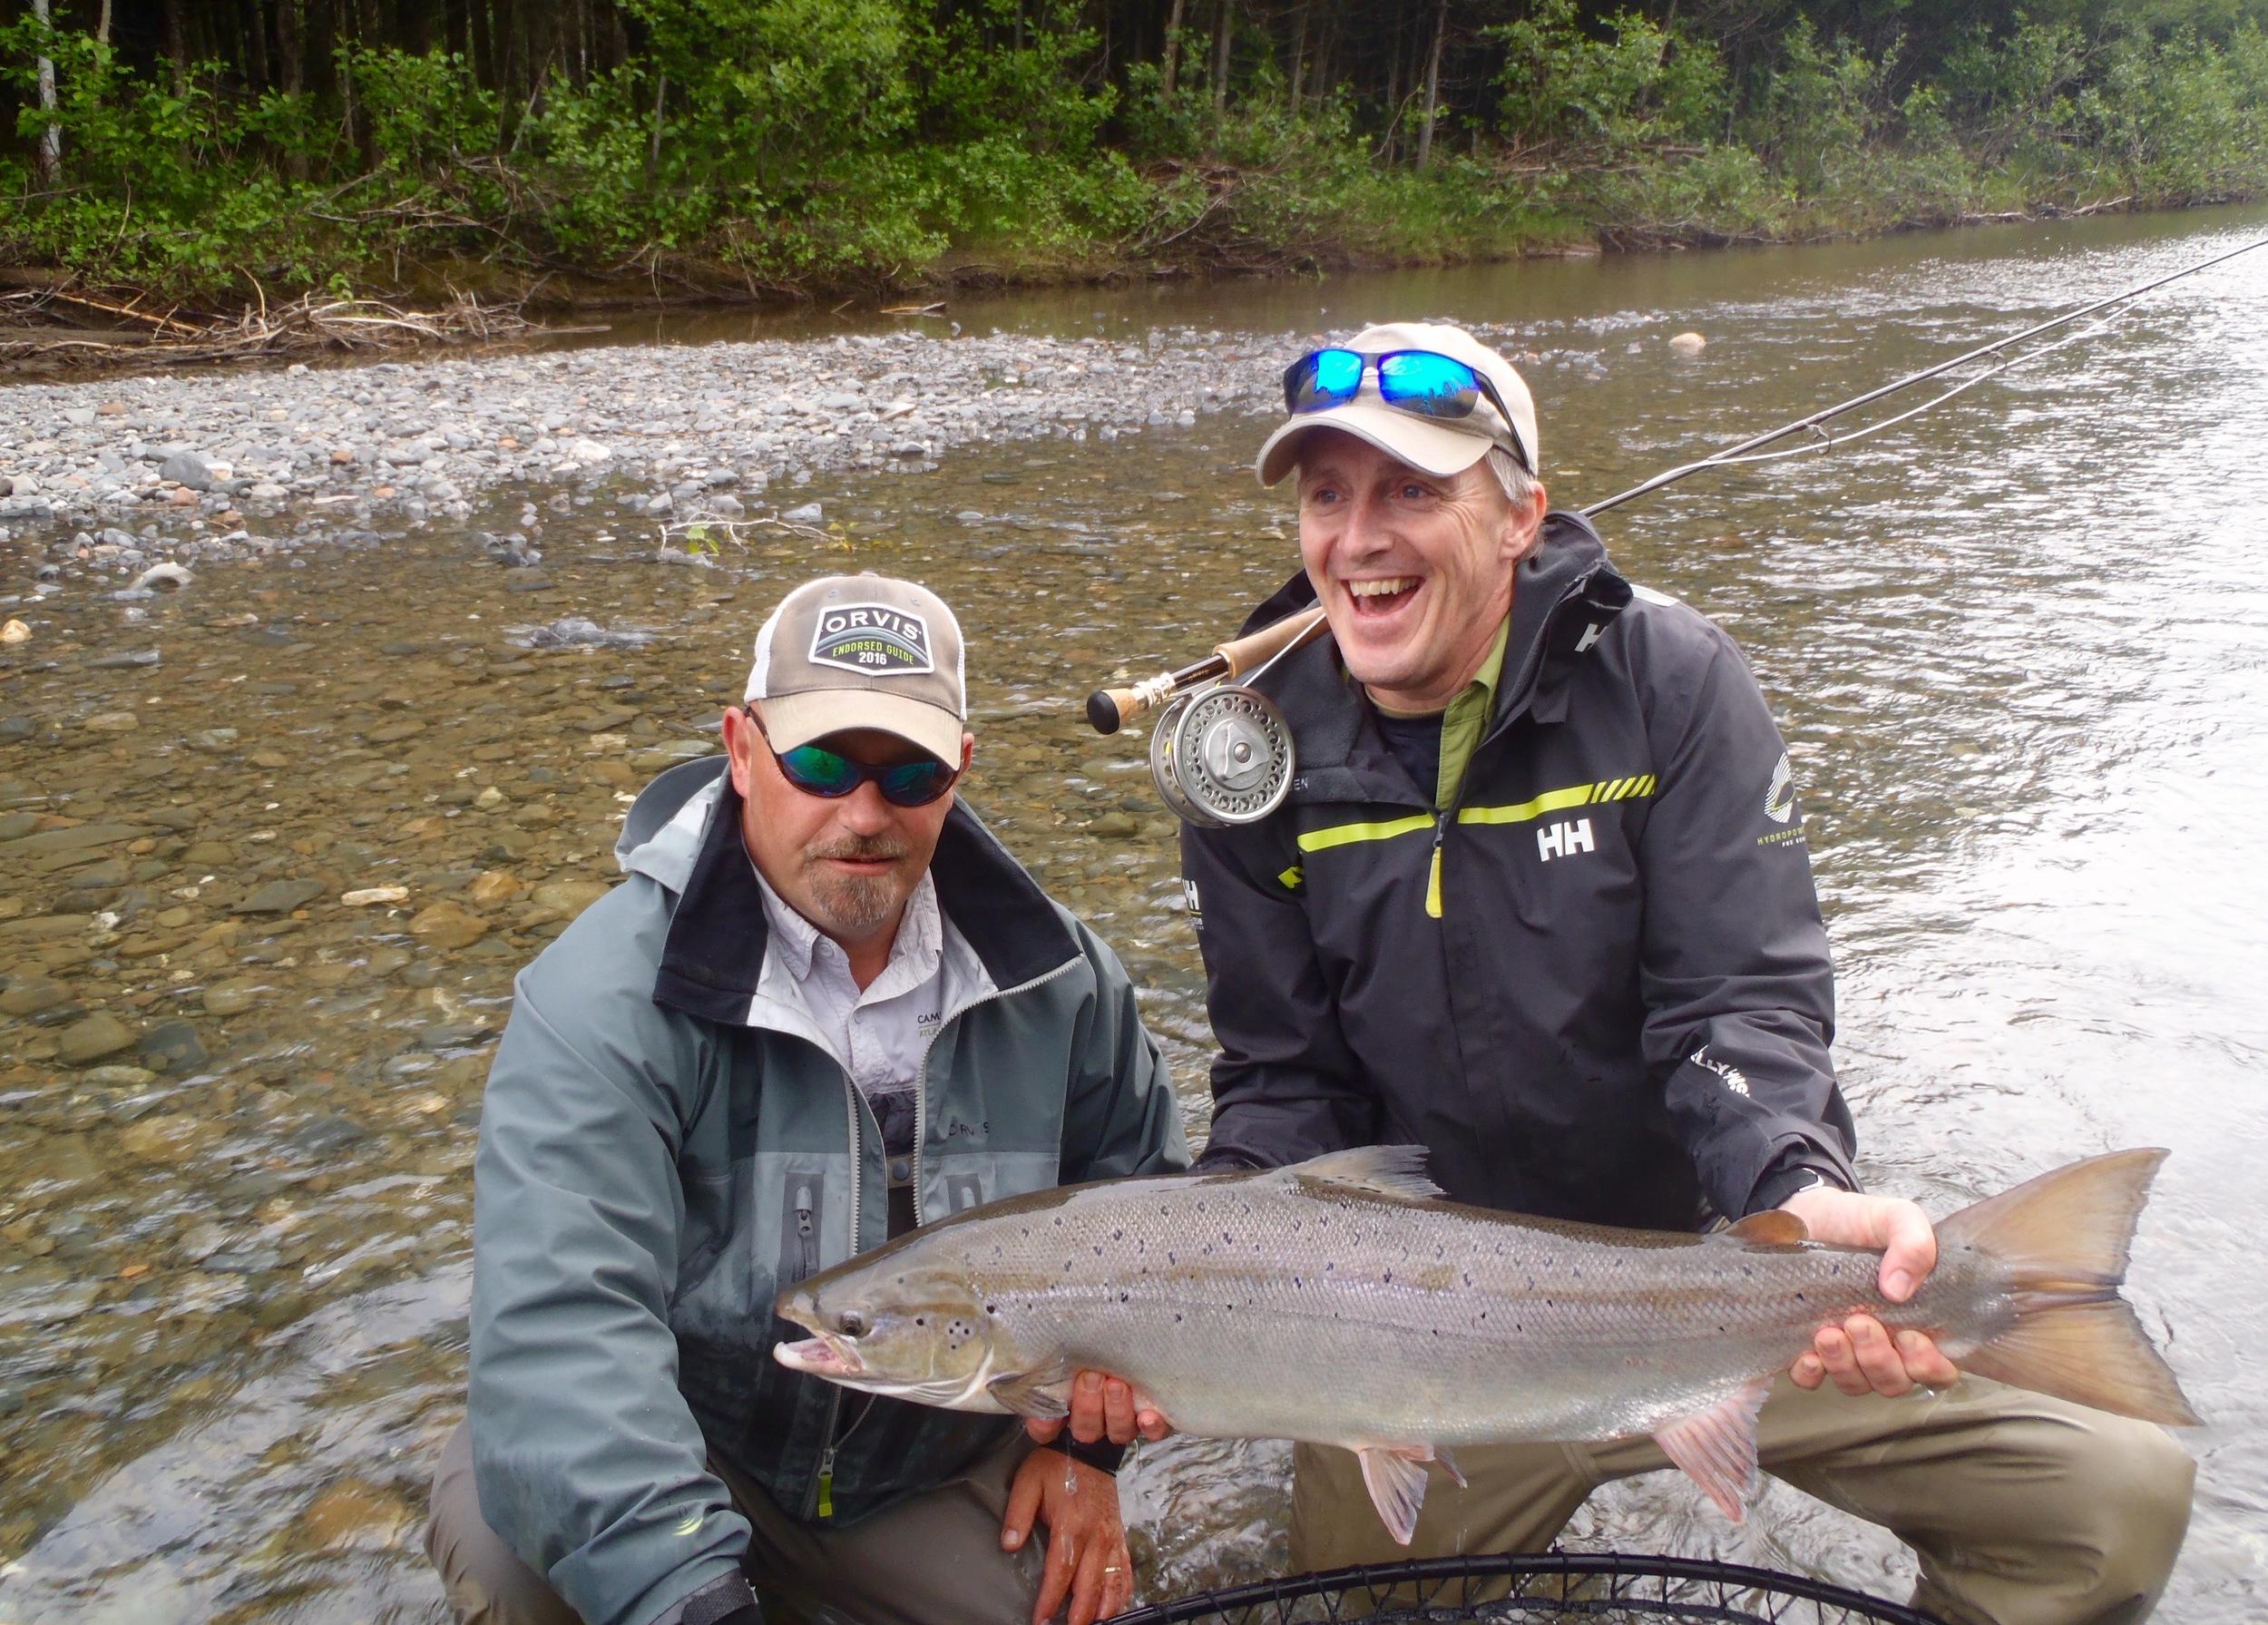 Pierre Vachon (right) and Camp Bonaventure guide John Law with a fine salmon from the Petite Cascapedia. Congratulations Pierre!